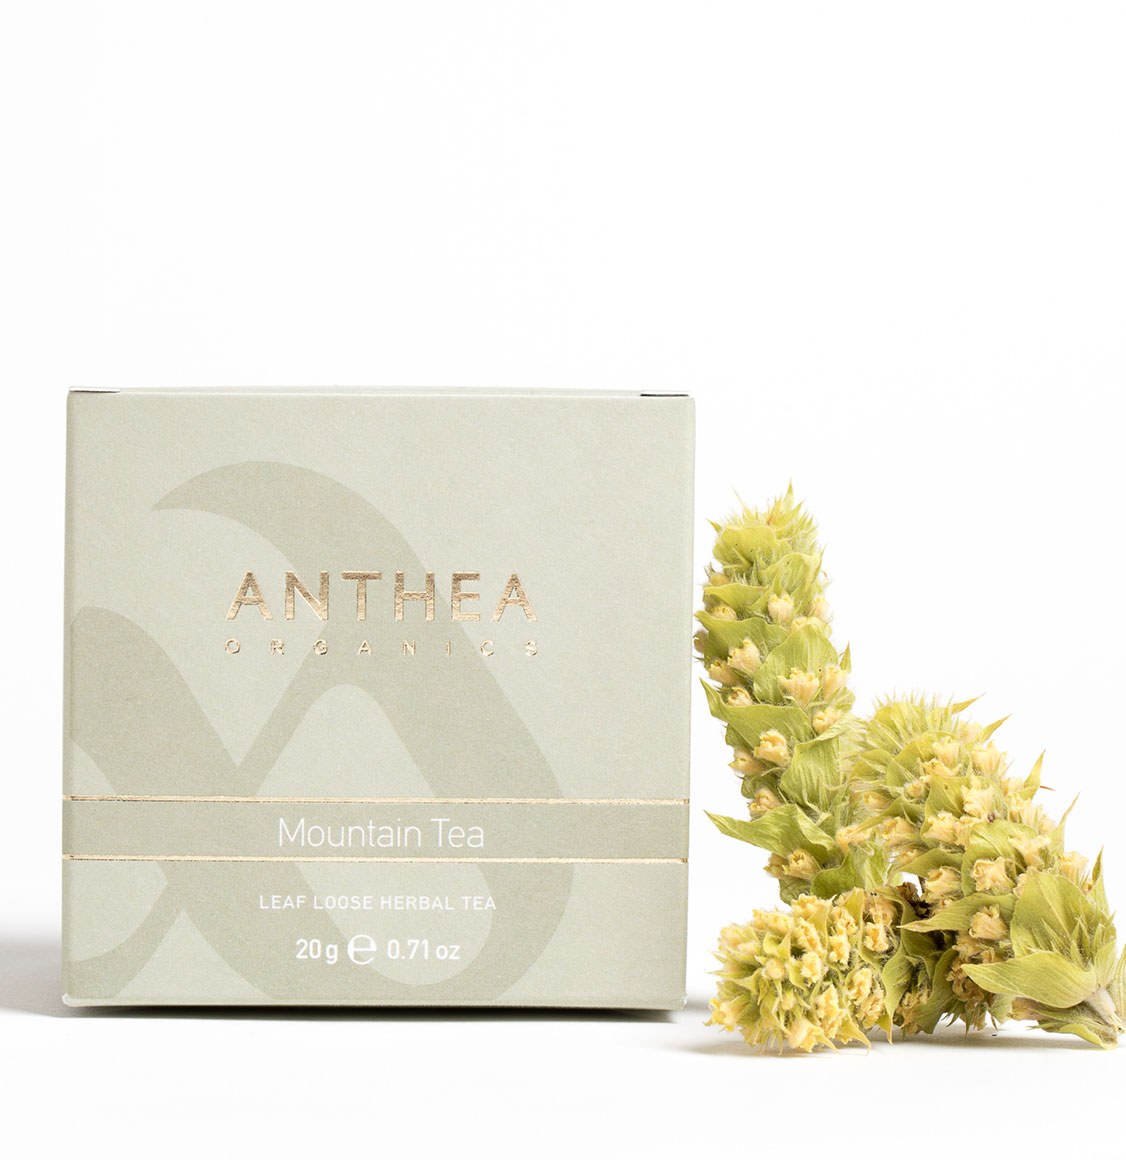 Anthea Organics Βιολογικό Τσάι Του Βουνού Leaf Loose Mountain Tea 20g